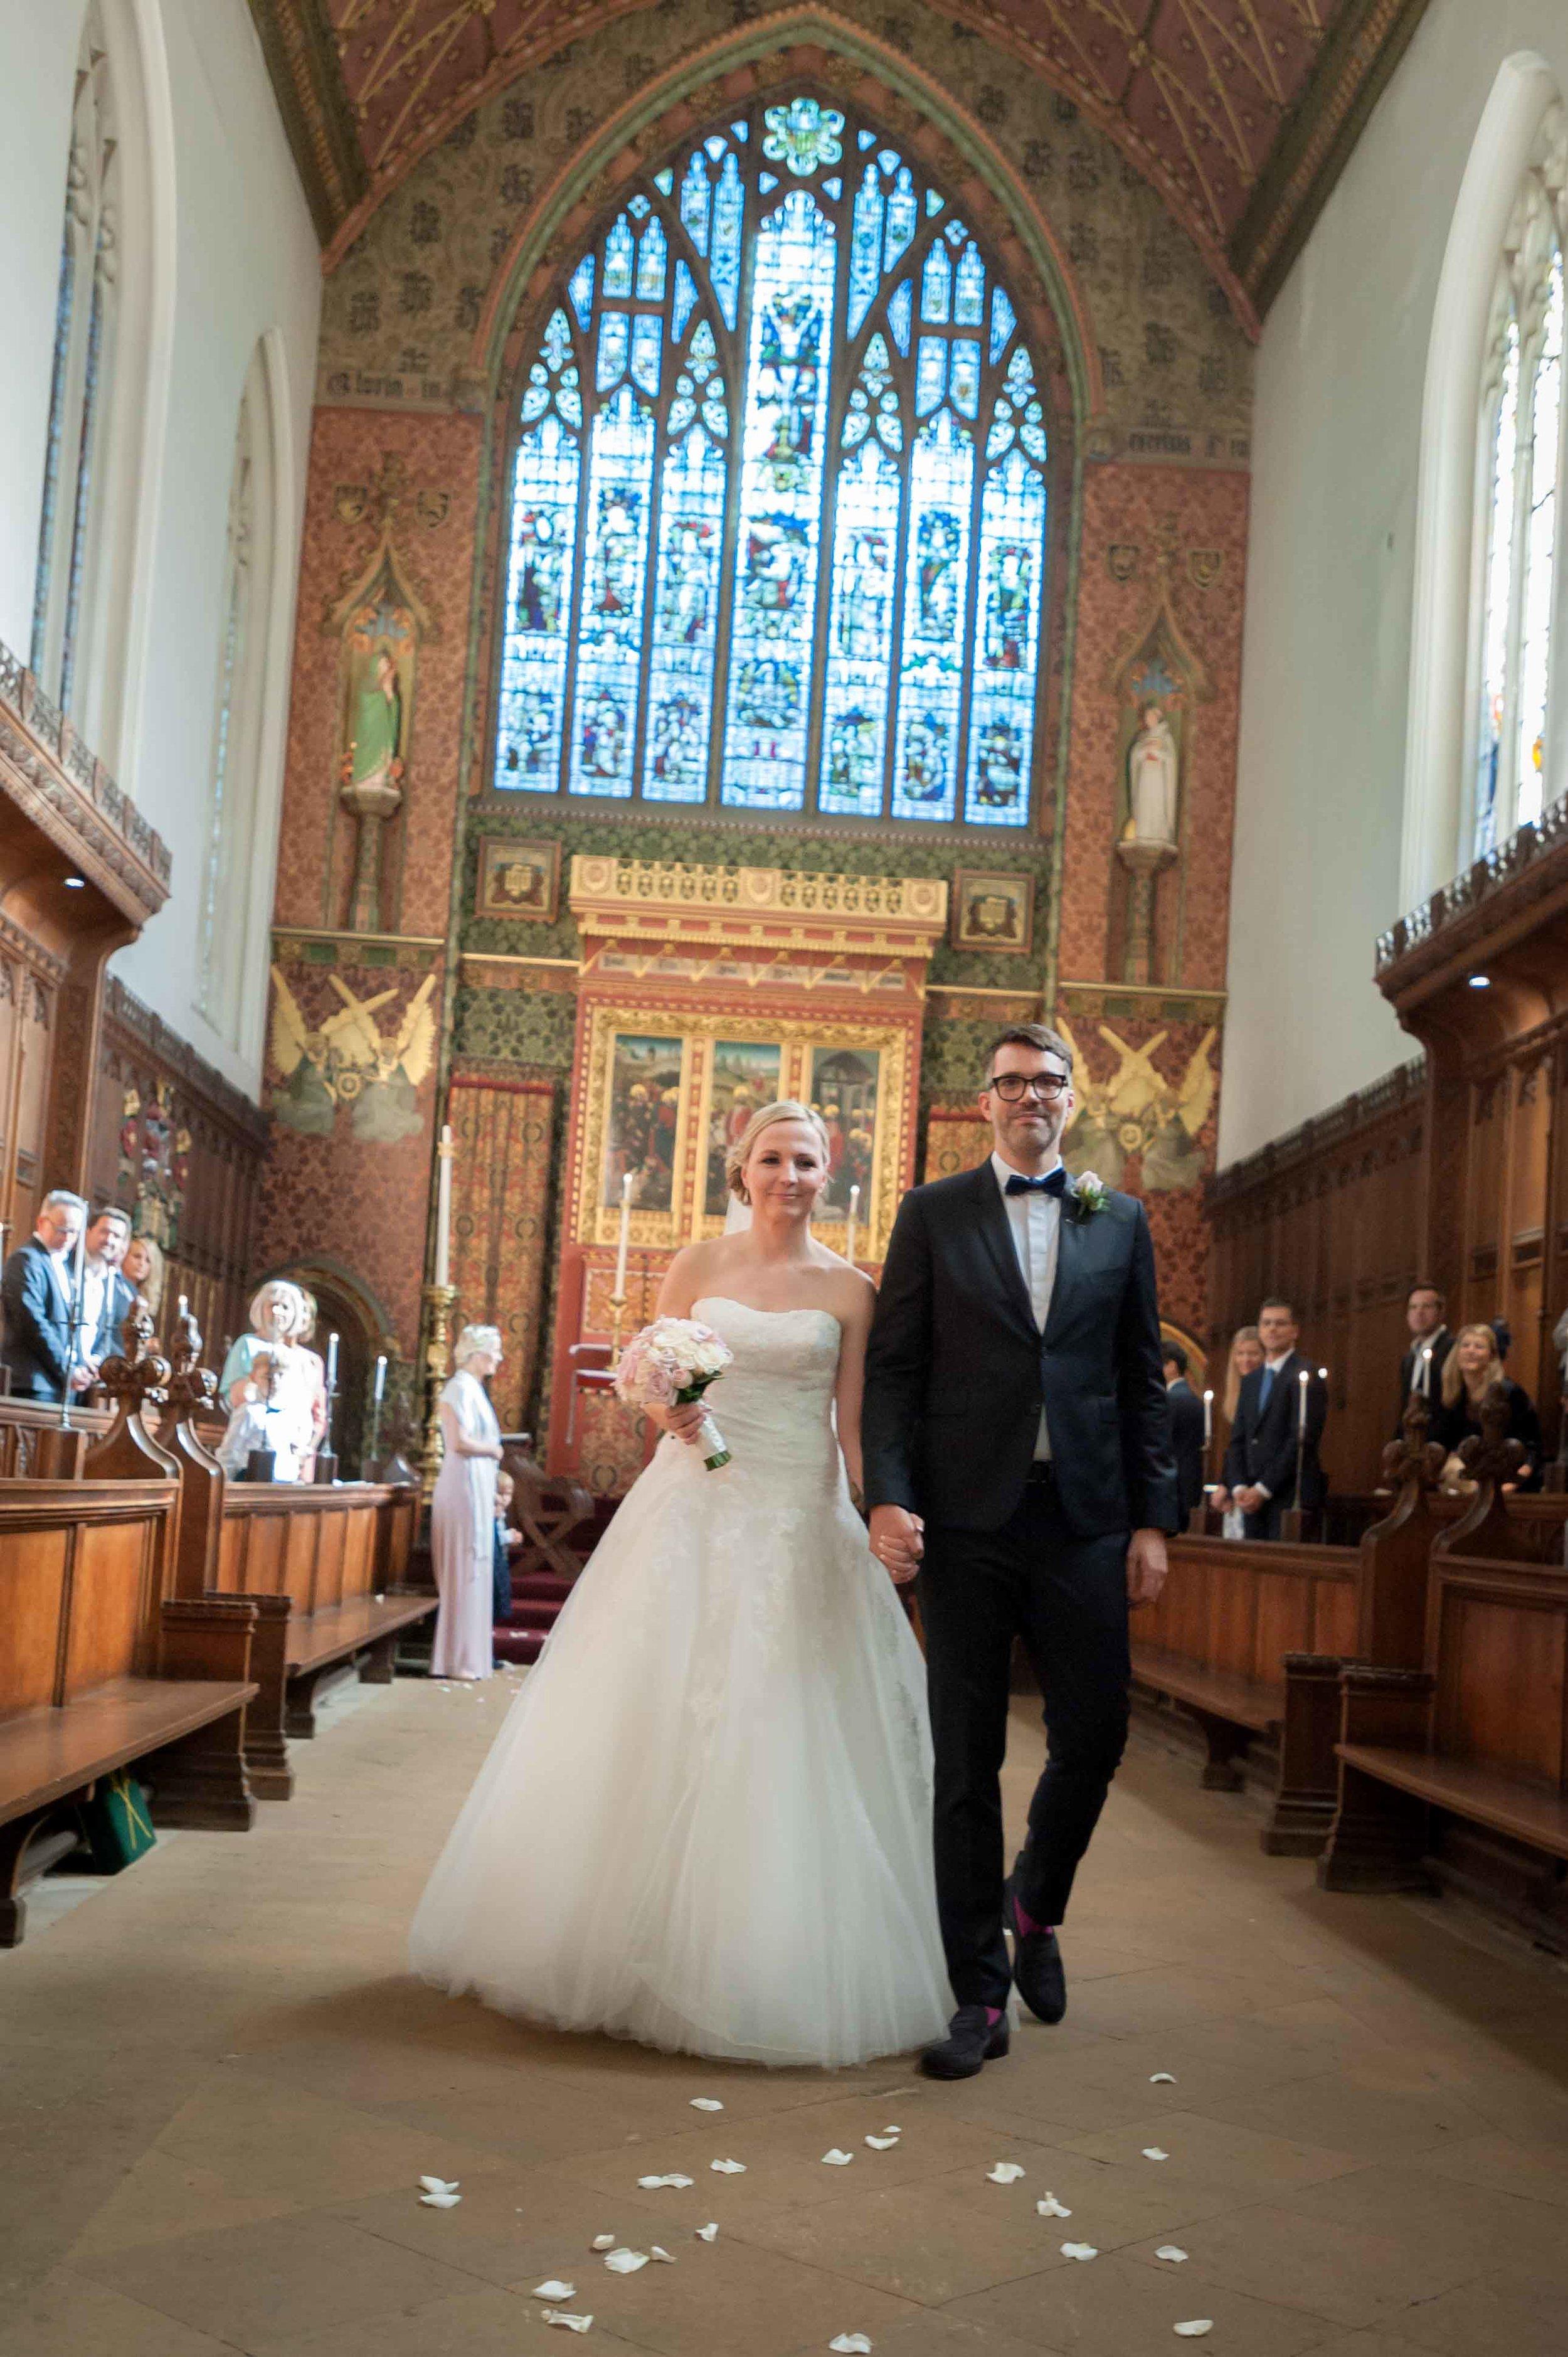 Adrian_Nicole_Charnwood_Weddings_Queens_College_Cambridge-1025.jpg